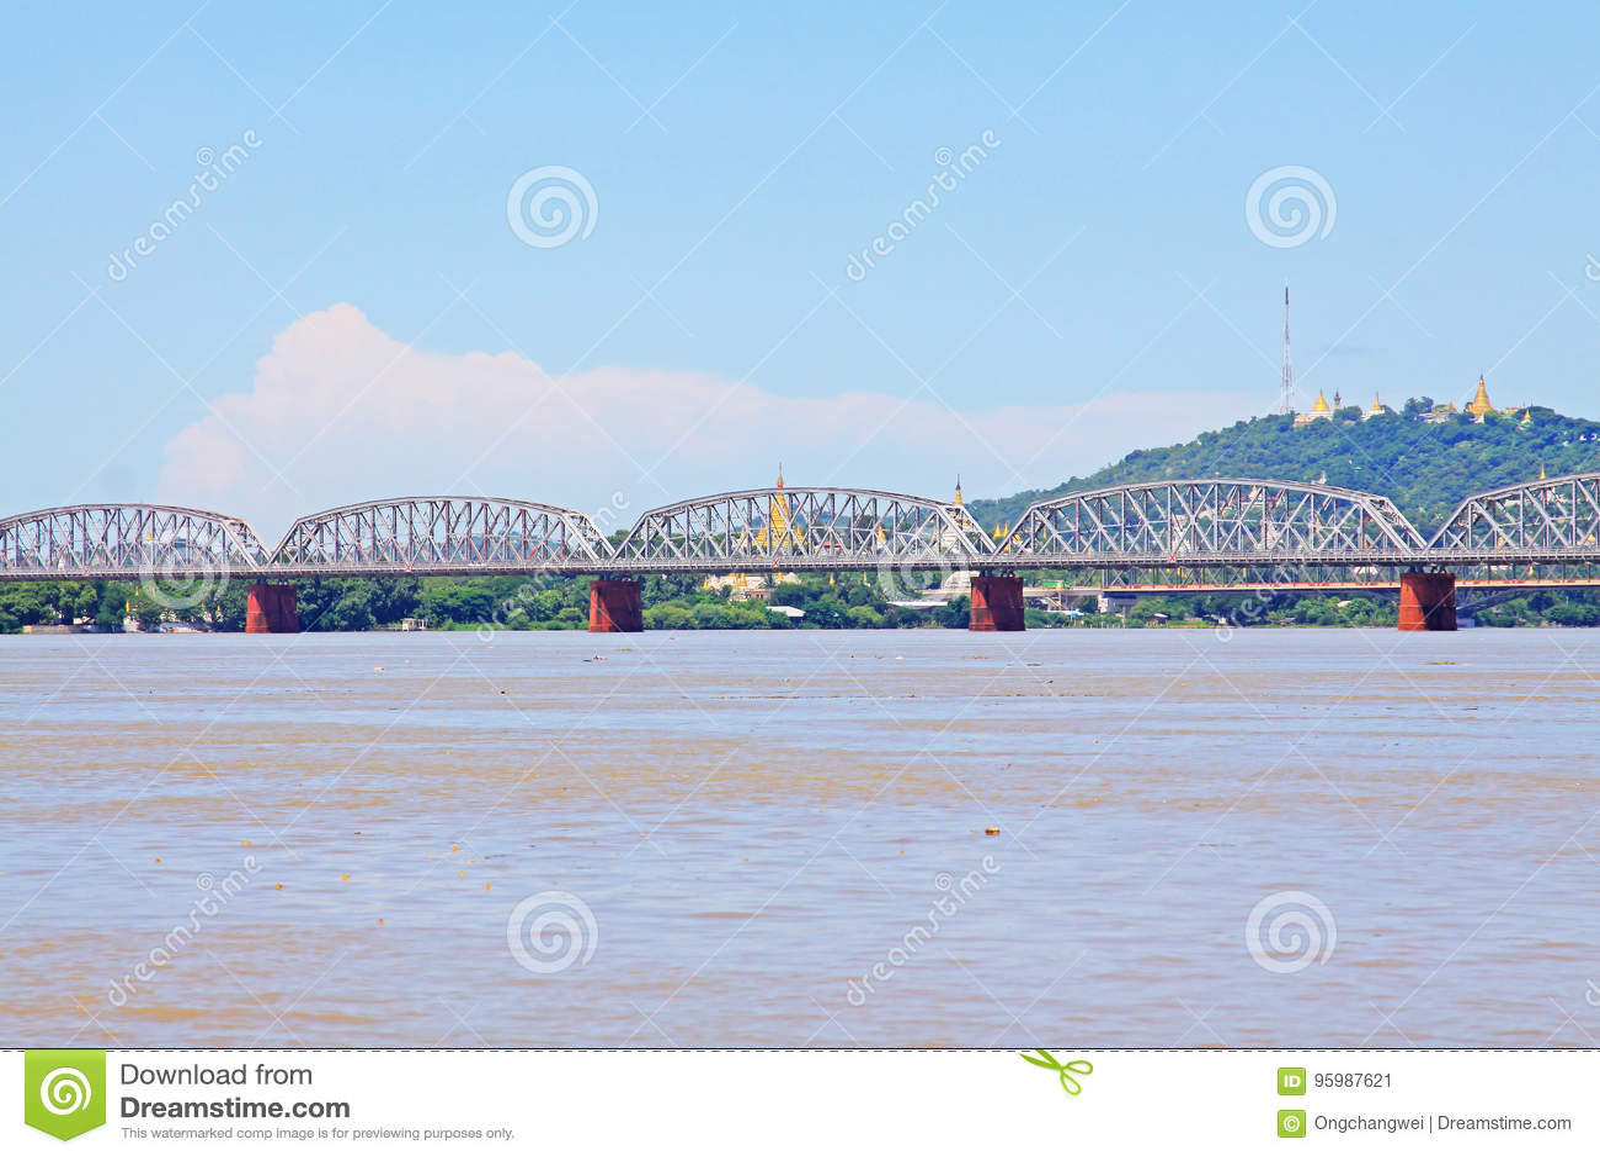 Fiume di Ava Bridge Cross The Irrawaddy, Sagaing, Myanmar